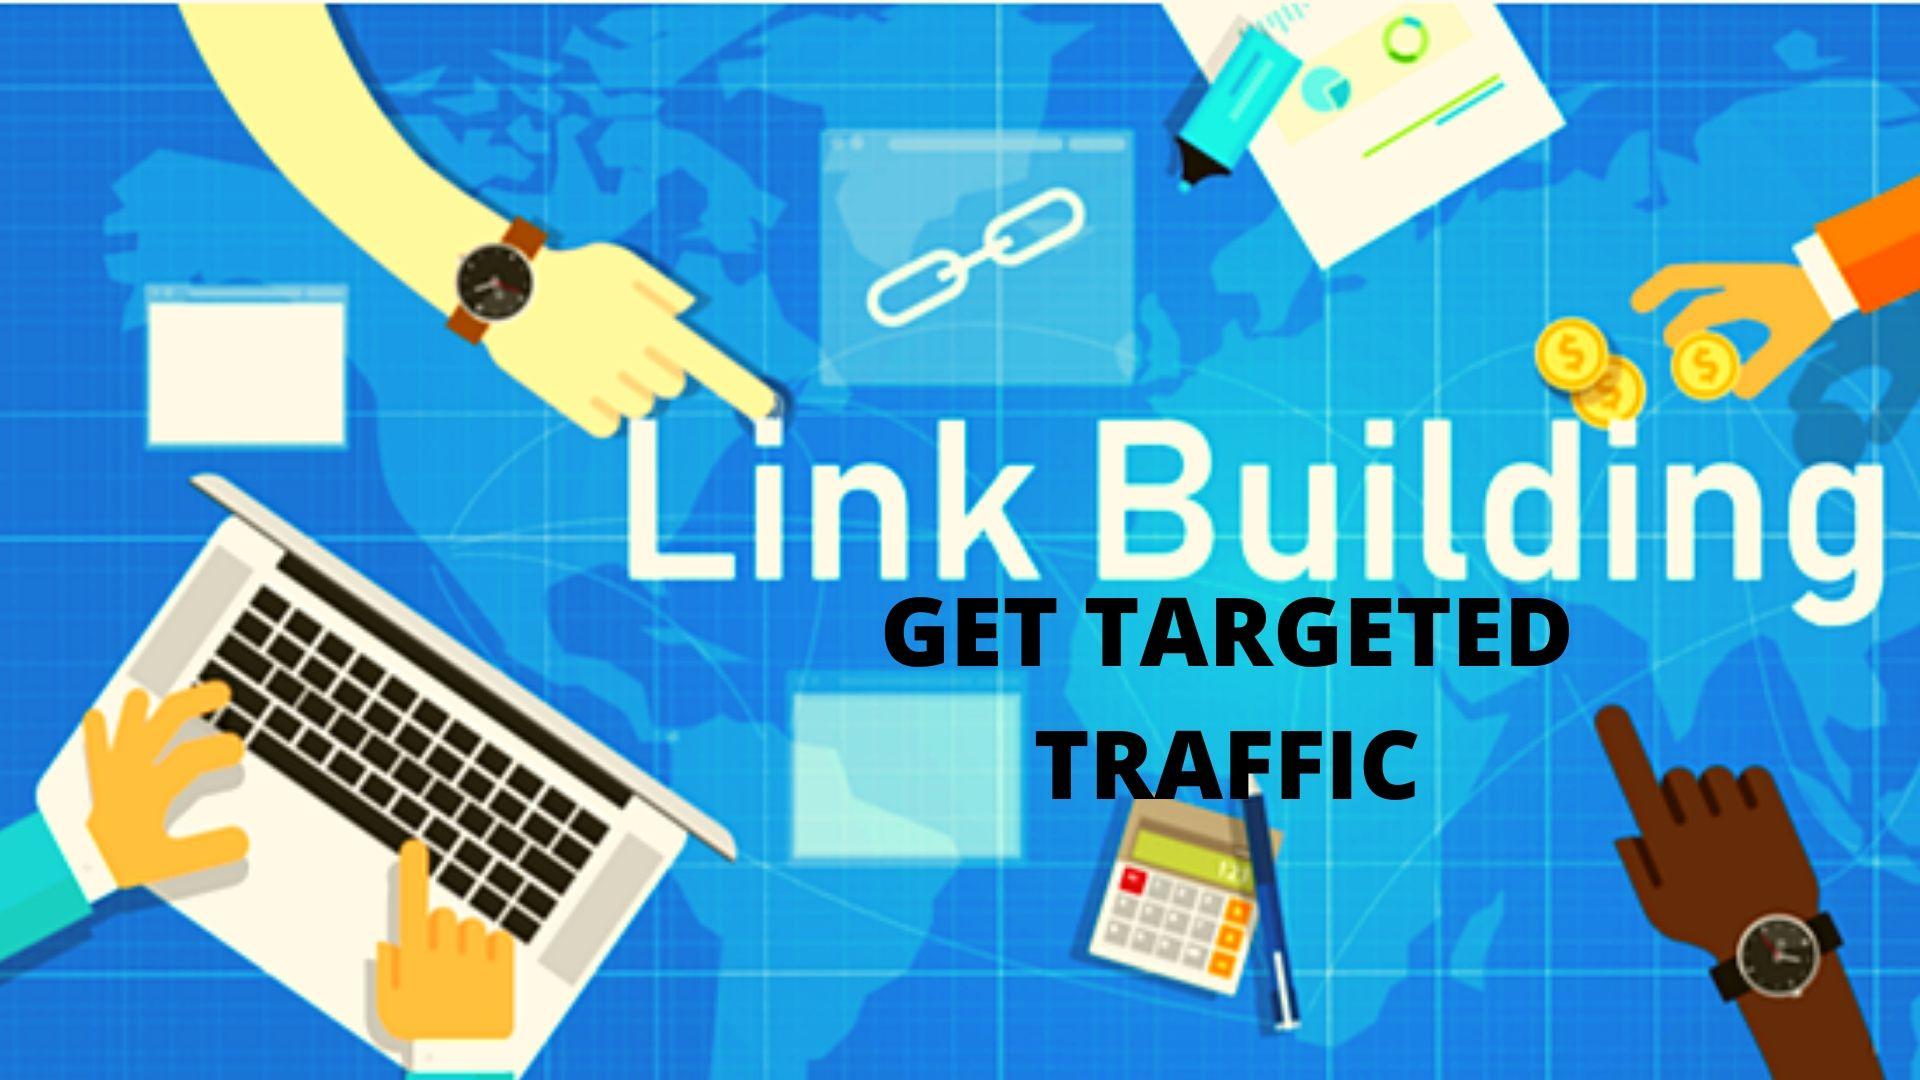 Get 30+ whitehat seo linkbuilding